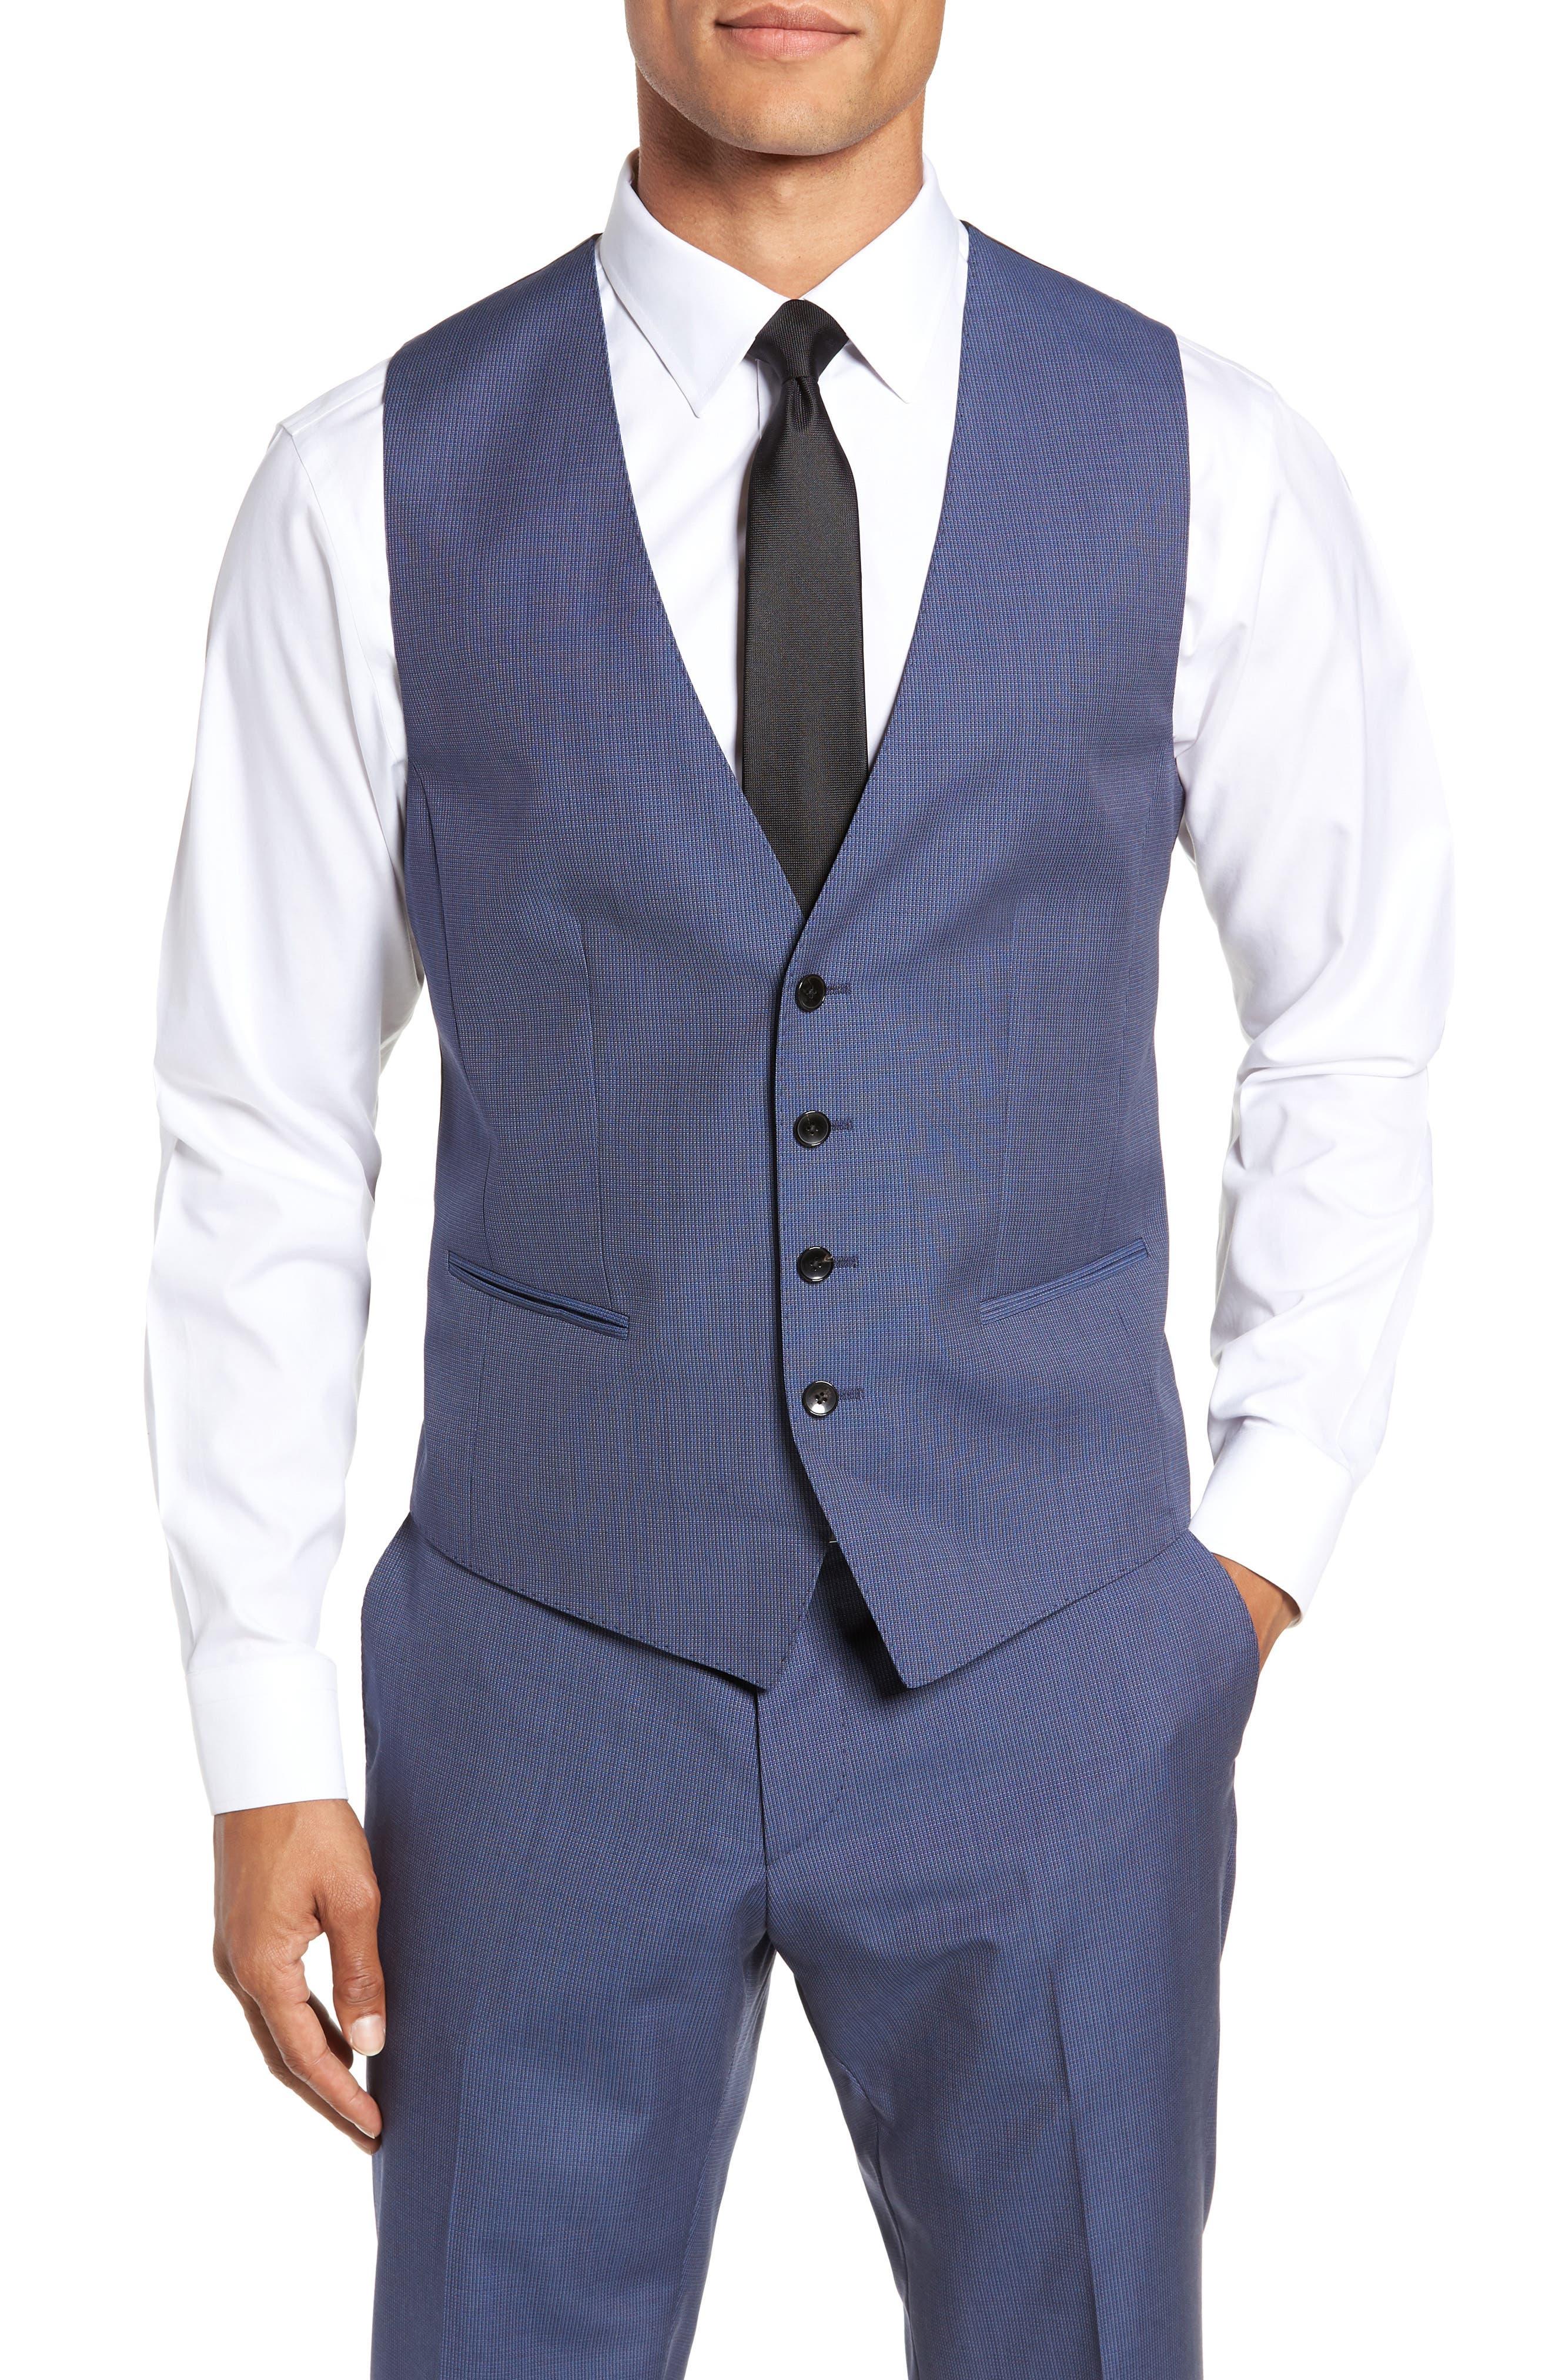 Huge/Genius Trim Fit Solid Three Piece Wool Suit,                             Main thumbnail 1, color,                             BLUE